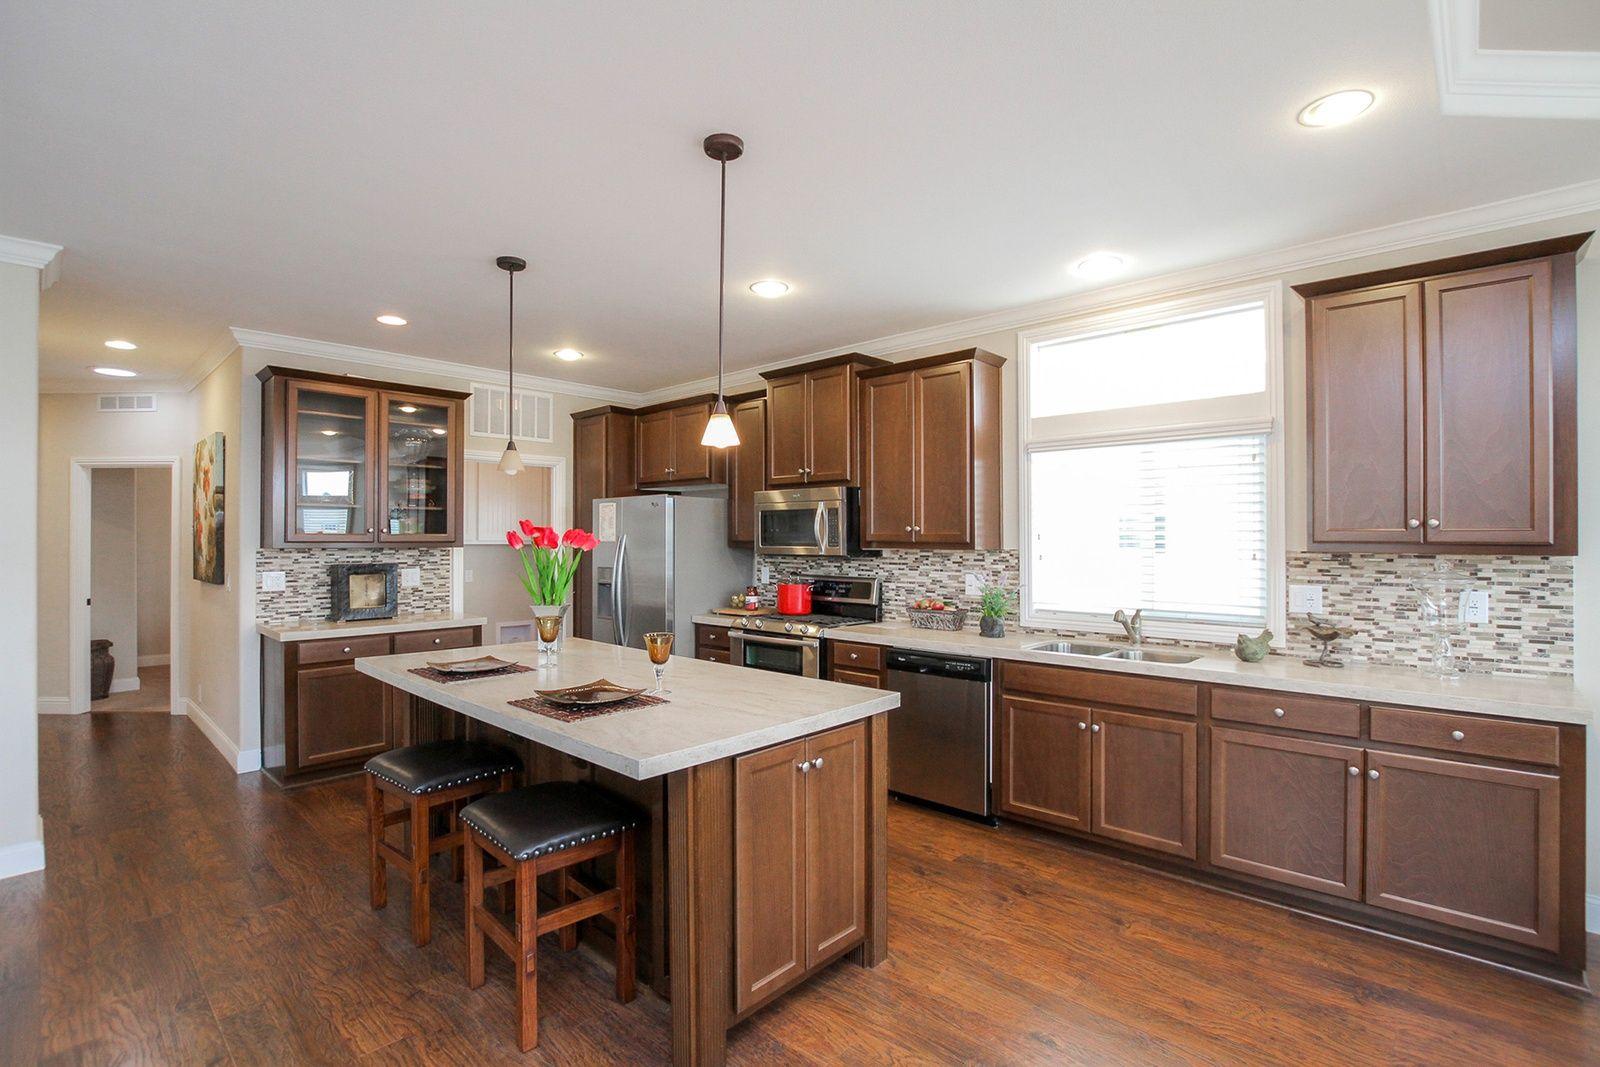 Calmly Mosaic Tile Large Open Plan Kitchens Large Kitchens Island Mosaic Tile Stainkitchen Large Large Kitchen Large Kitchen